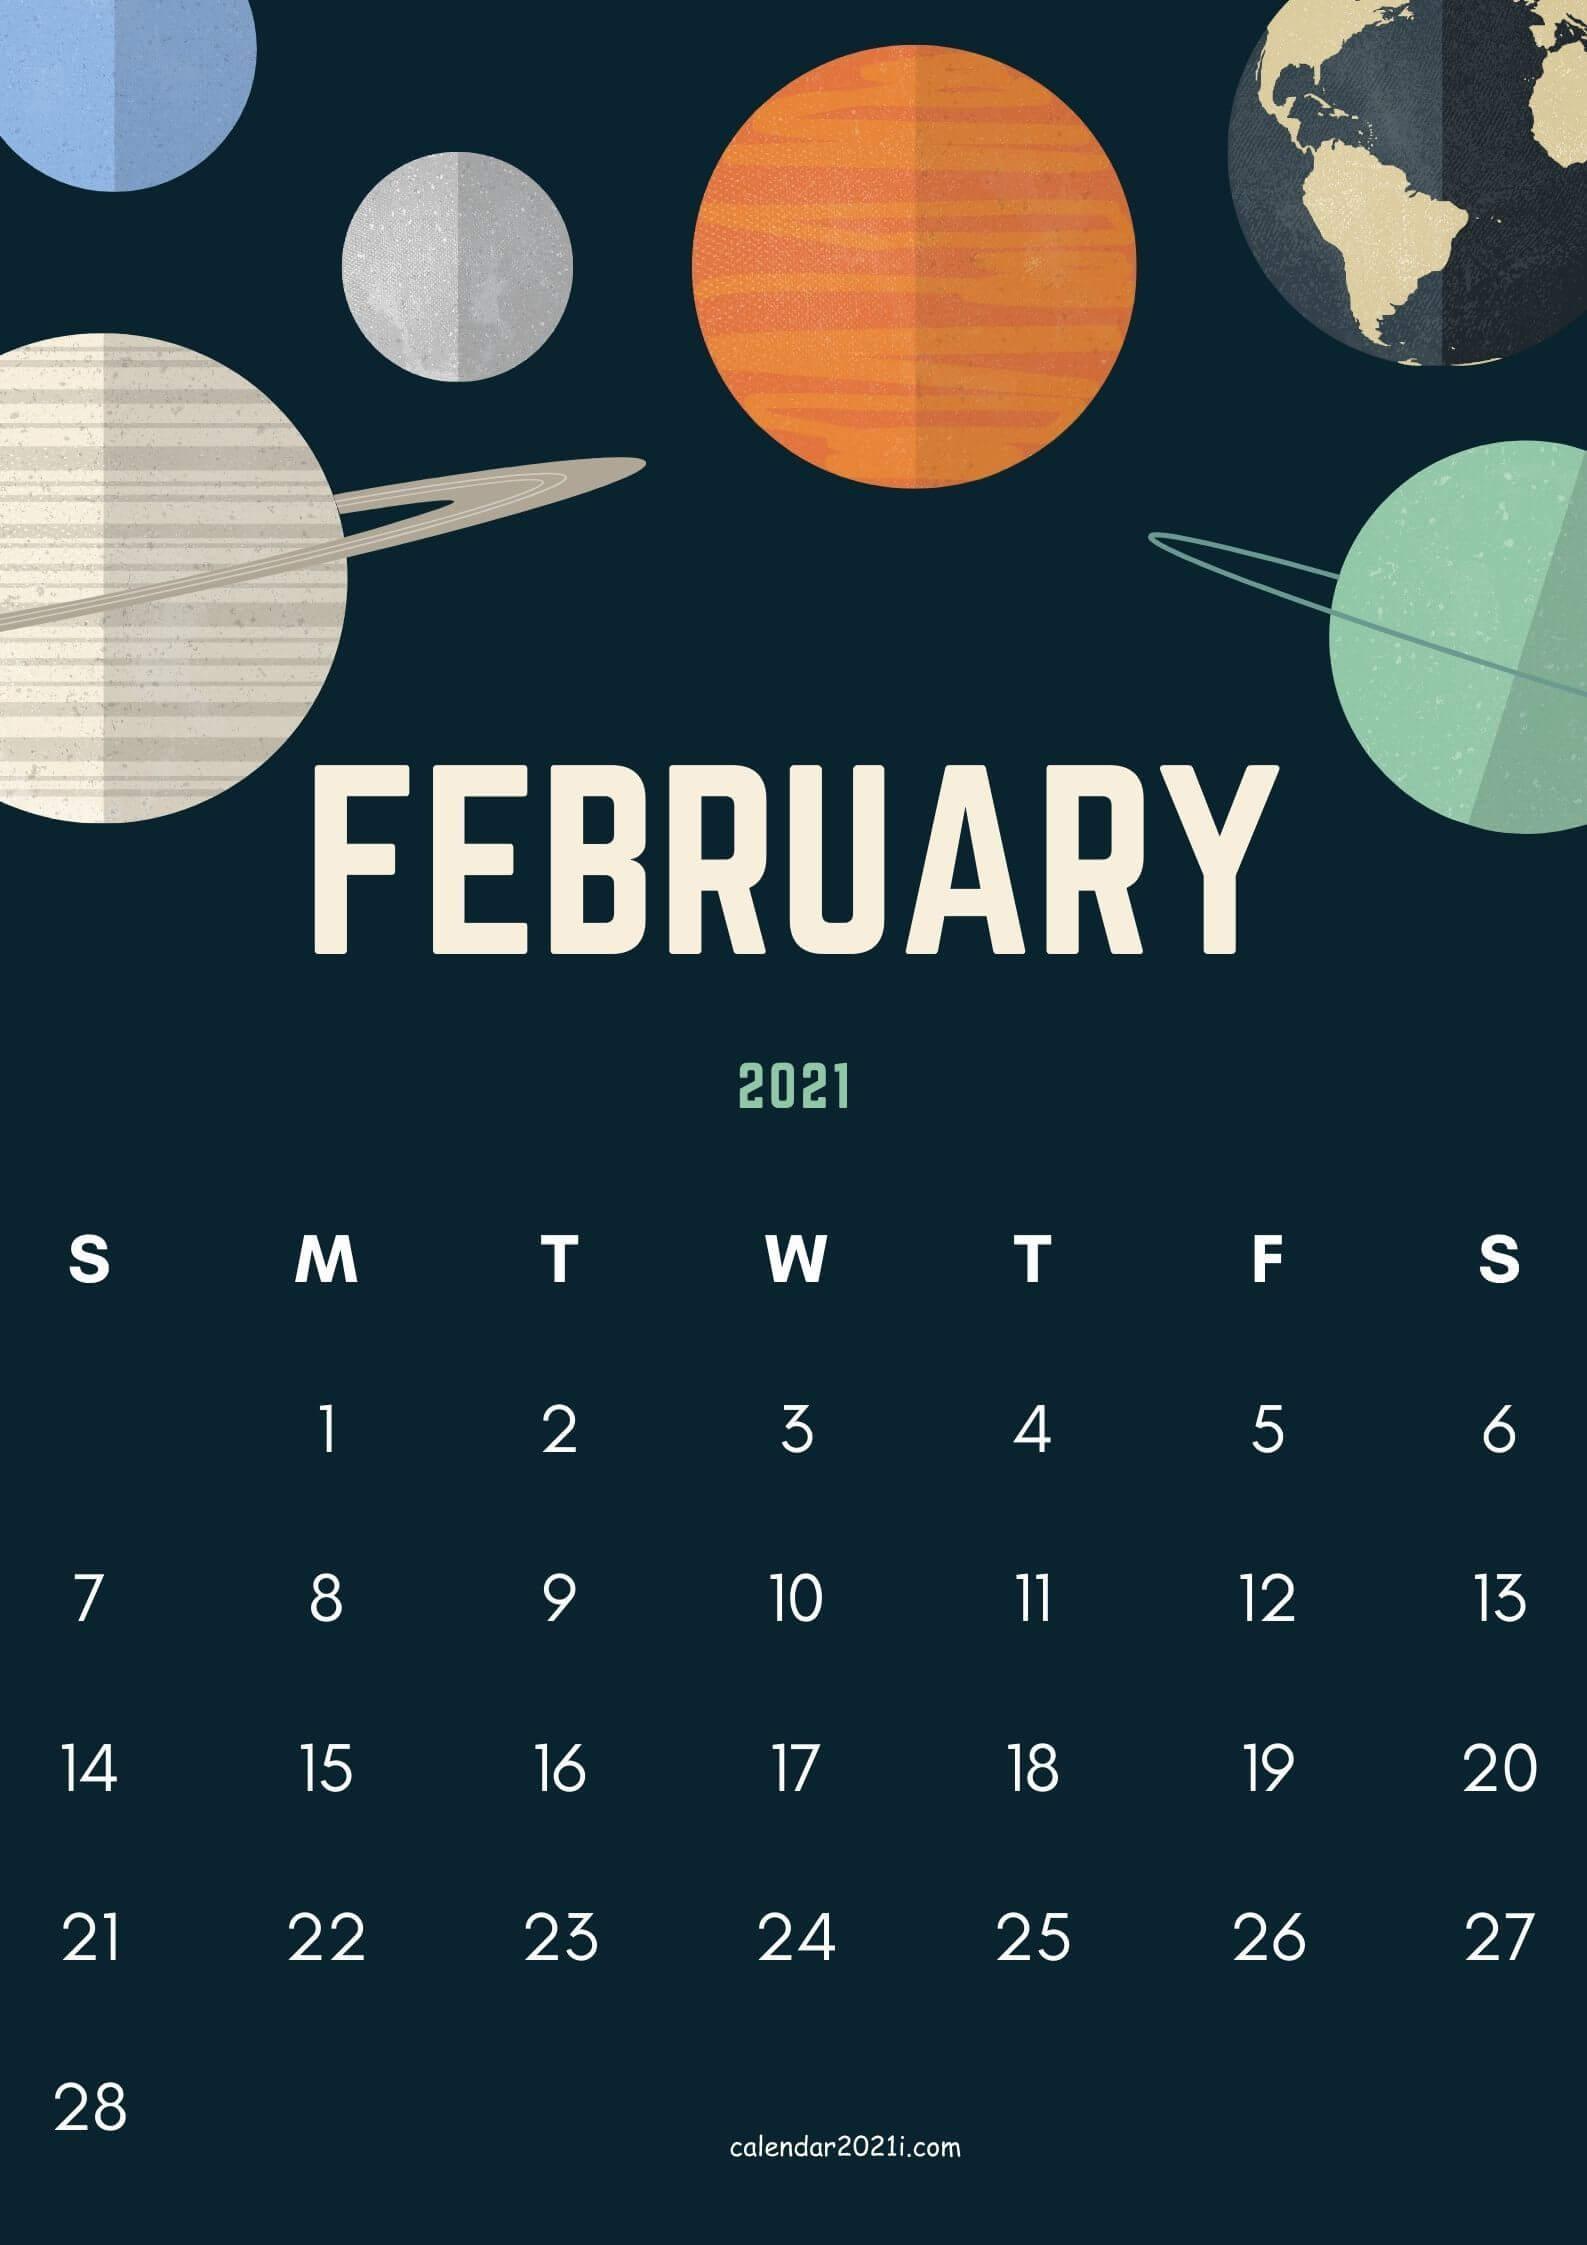 iPhone February 2021 Calendar Wallpaper